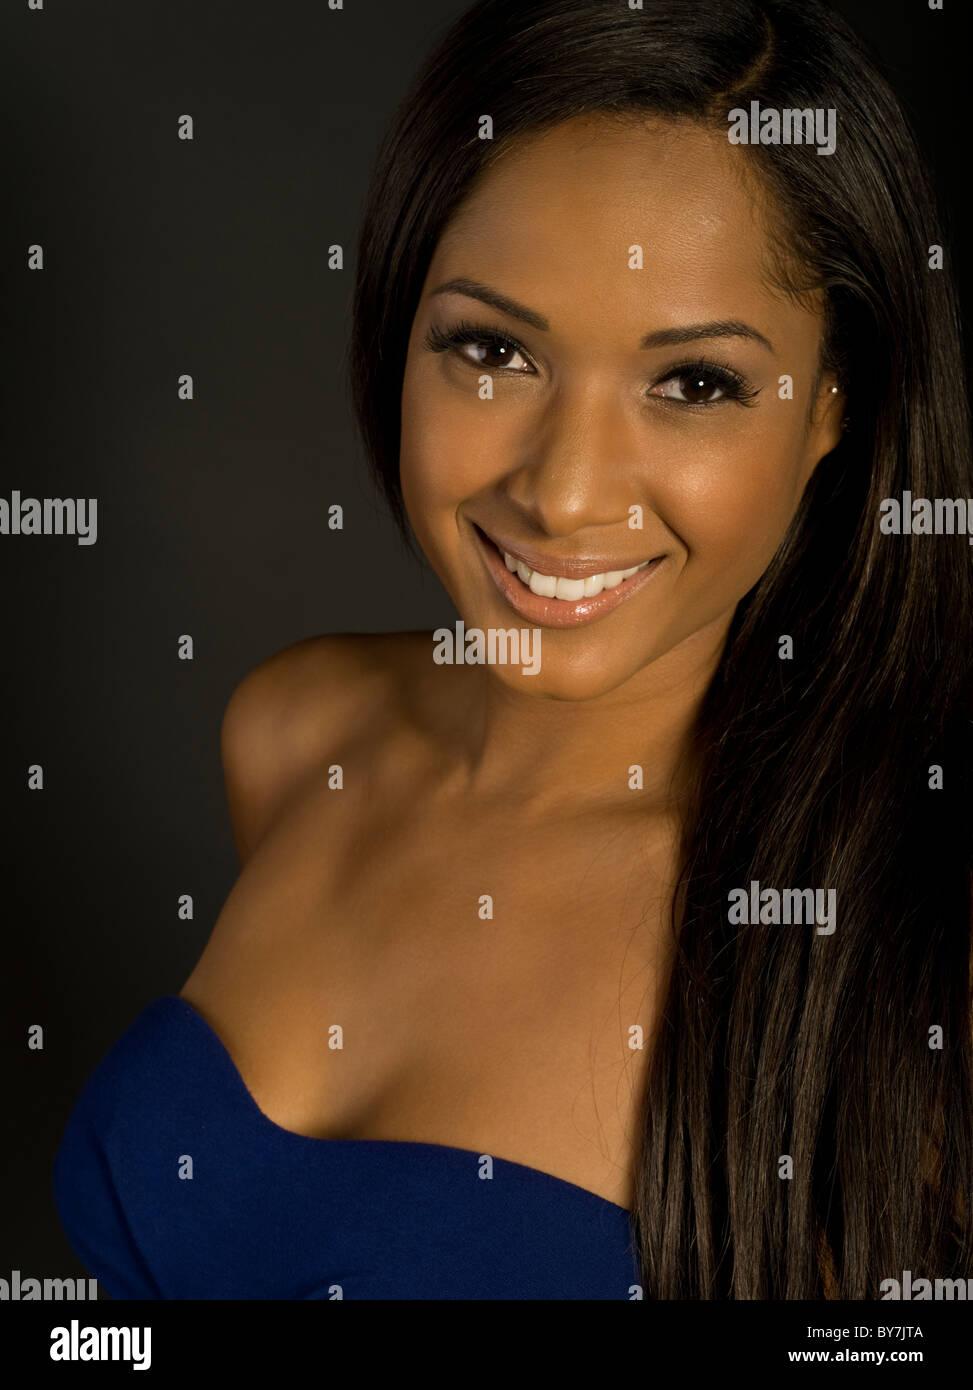 Studio Portrait beautiful woman thirties straight black hair smiling - Stock Image